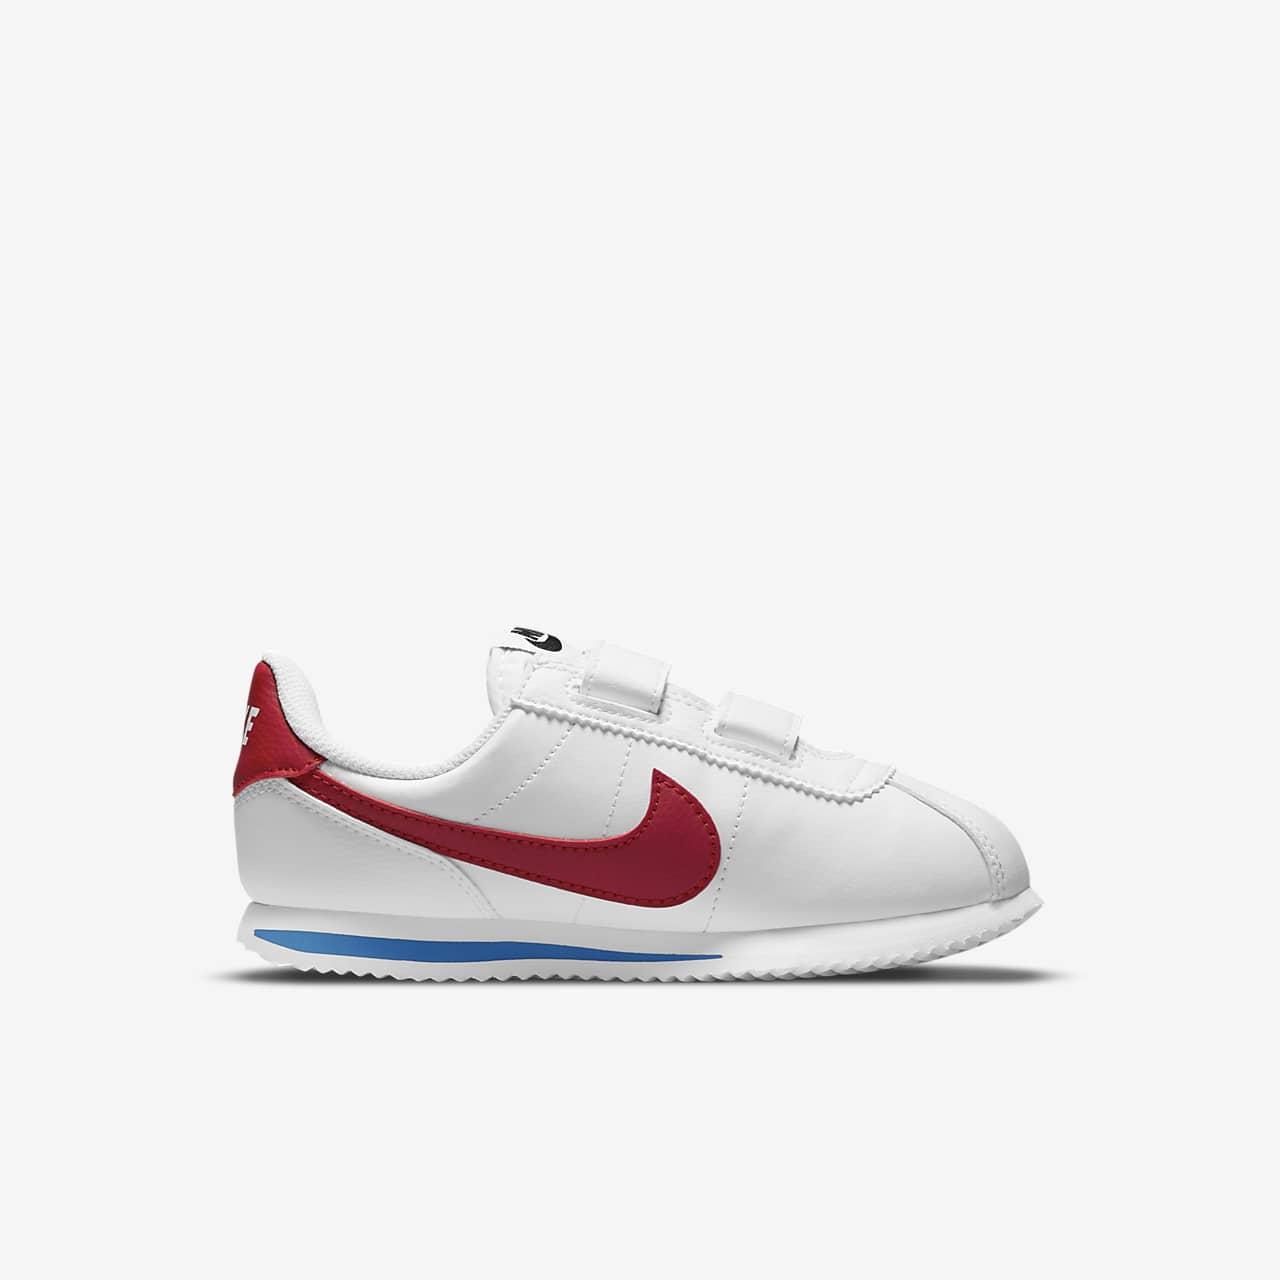 best service dd9c1 c02c8 ... Sko Nike Cortez Basic SL för barn